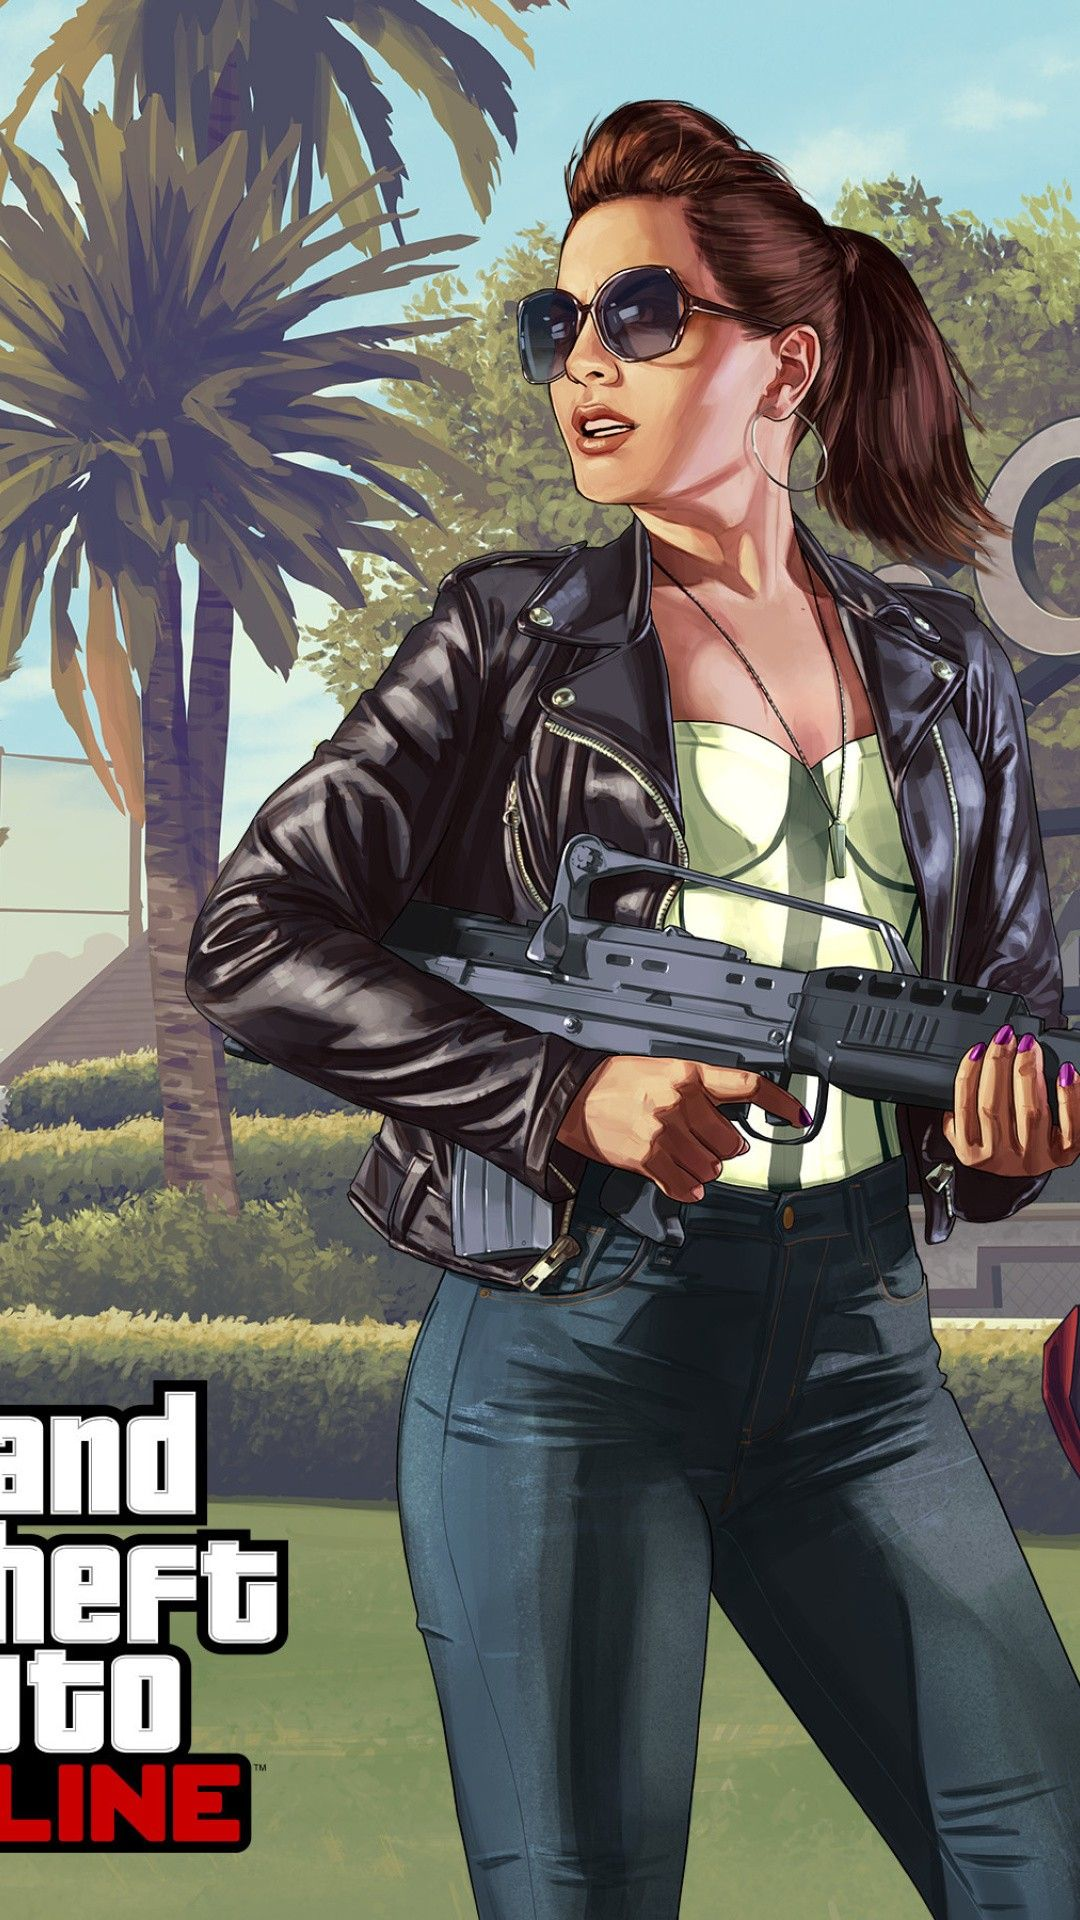 Gta V Wallpaper San Andreas Gta Gta Comics Girls